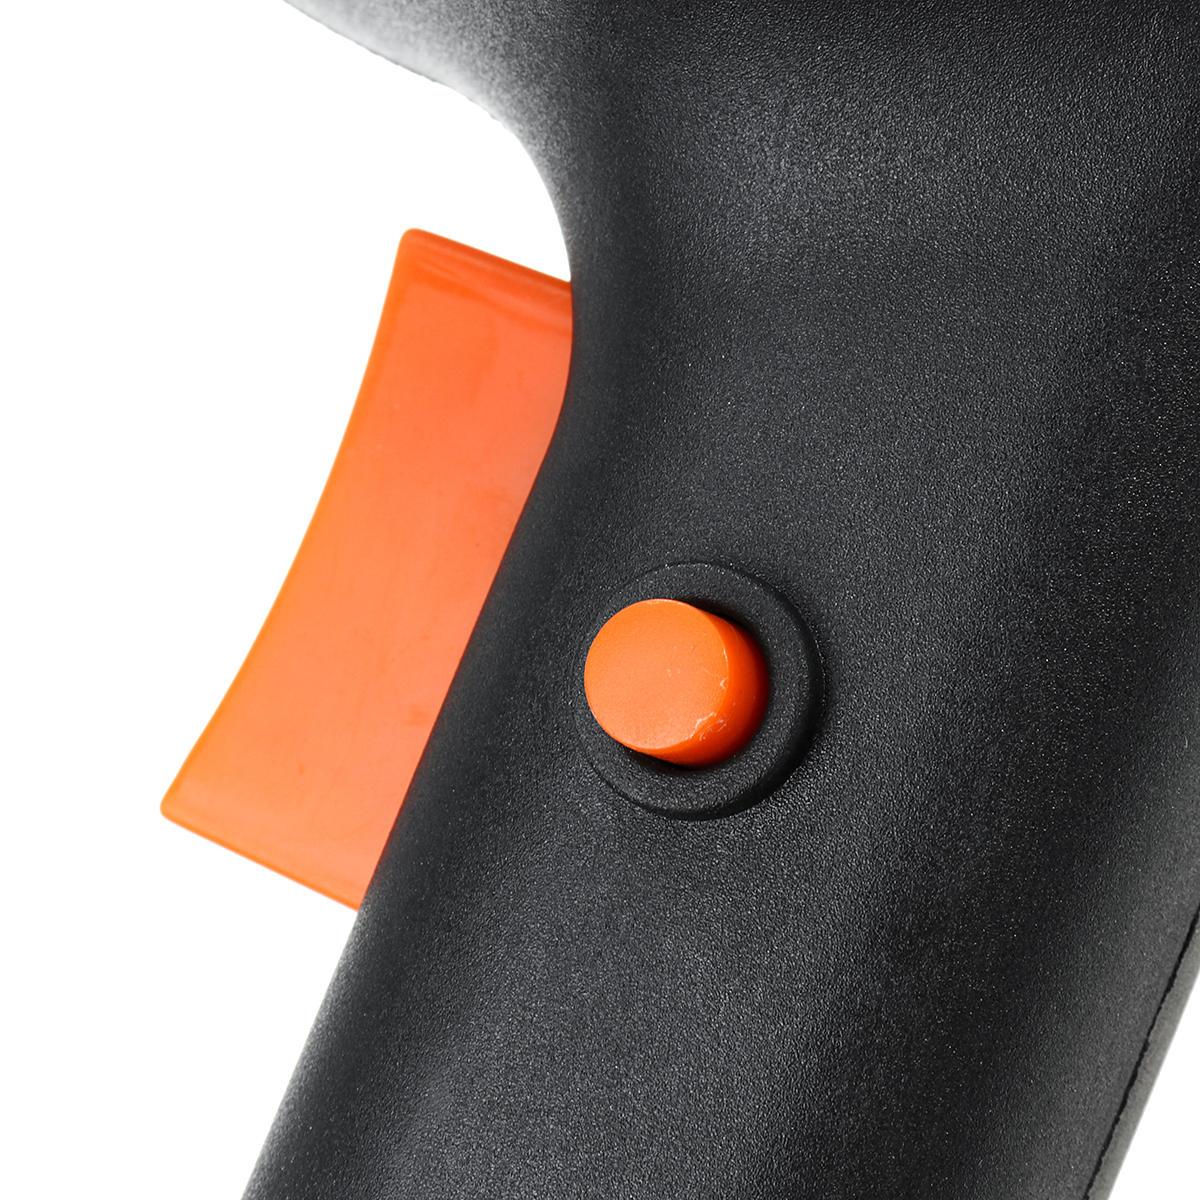 Electric Car Polisher Machine 600W Auto Polishing Machine Adjustable Speed Sanding Waxing Tools Car Accessories - 8